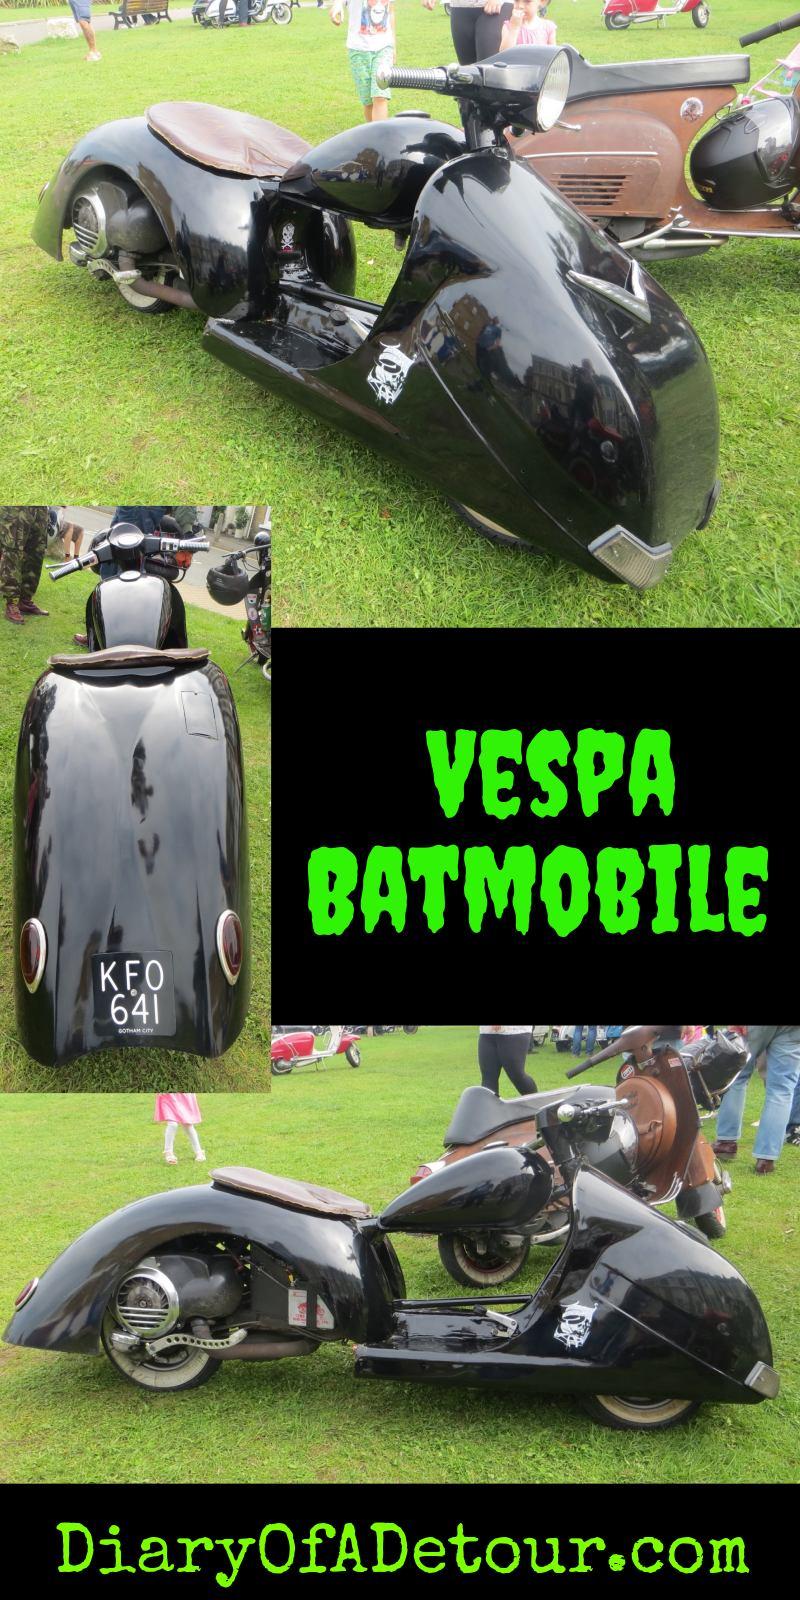 Vespa Batmobile scooter oddity